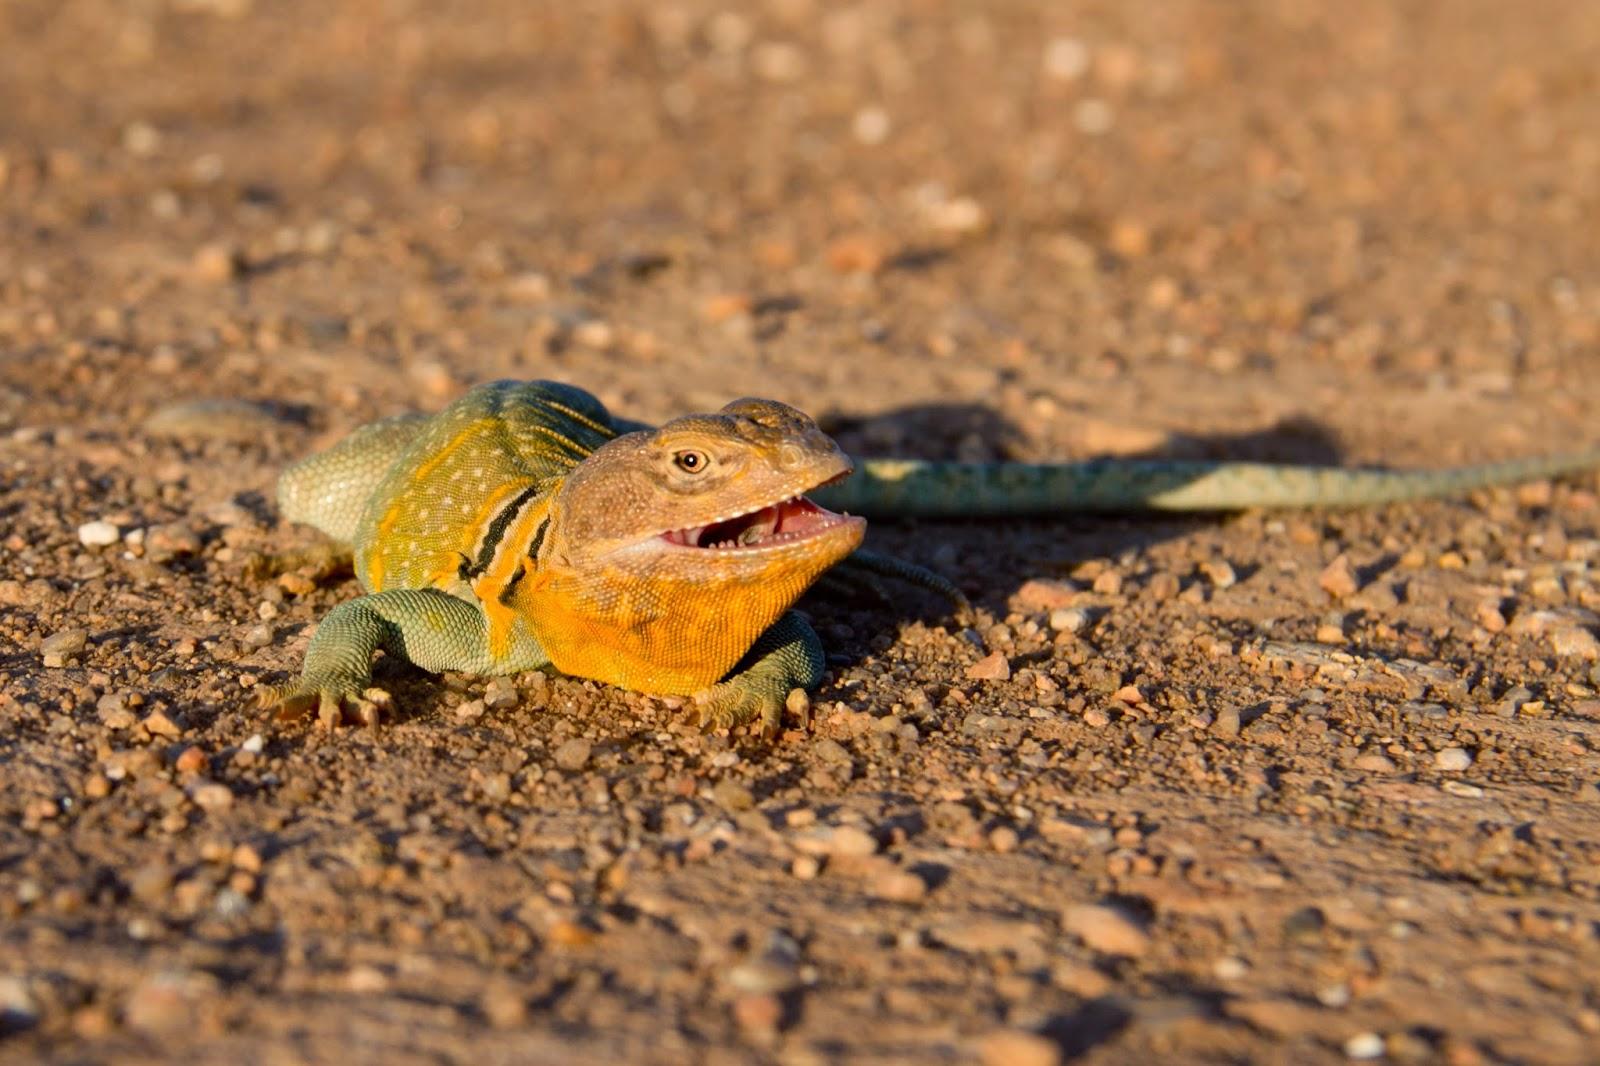 U S Lizard The Kansas Outb...